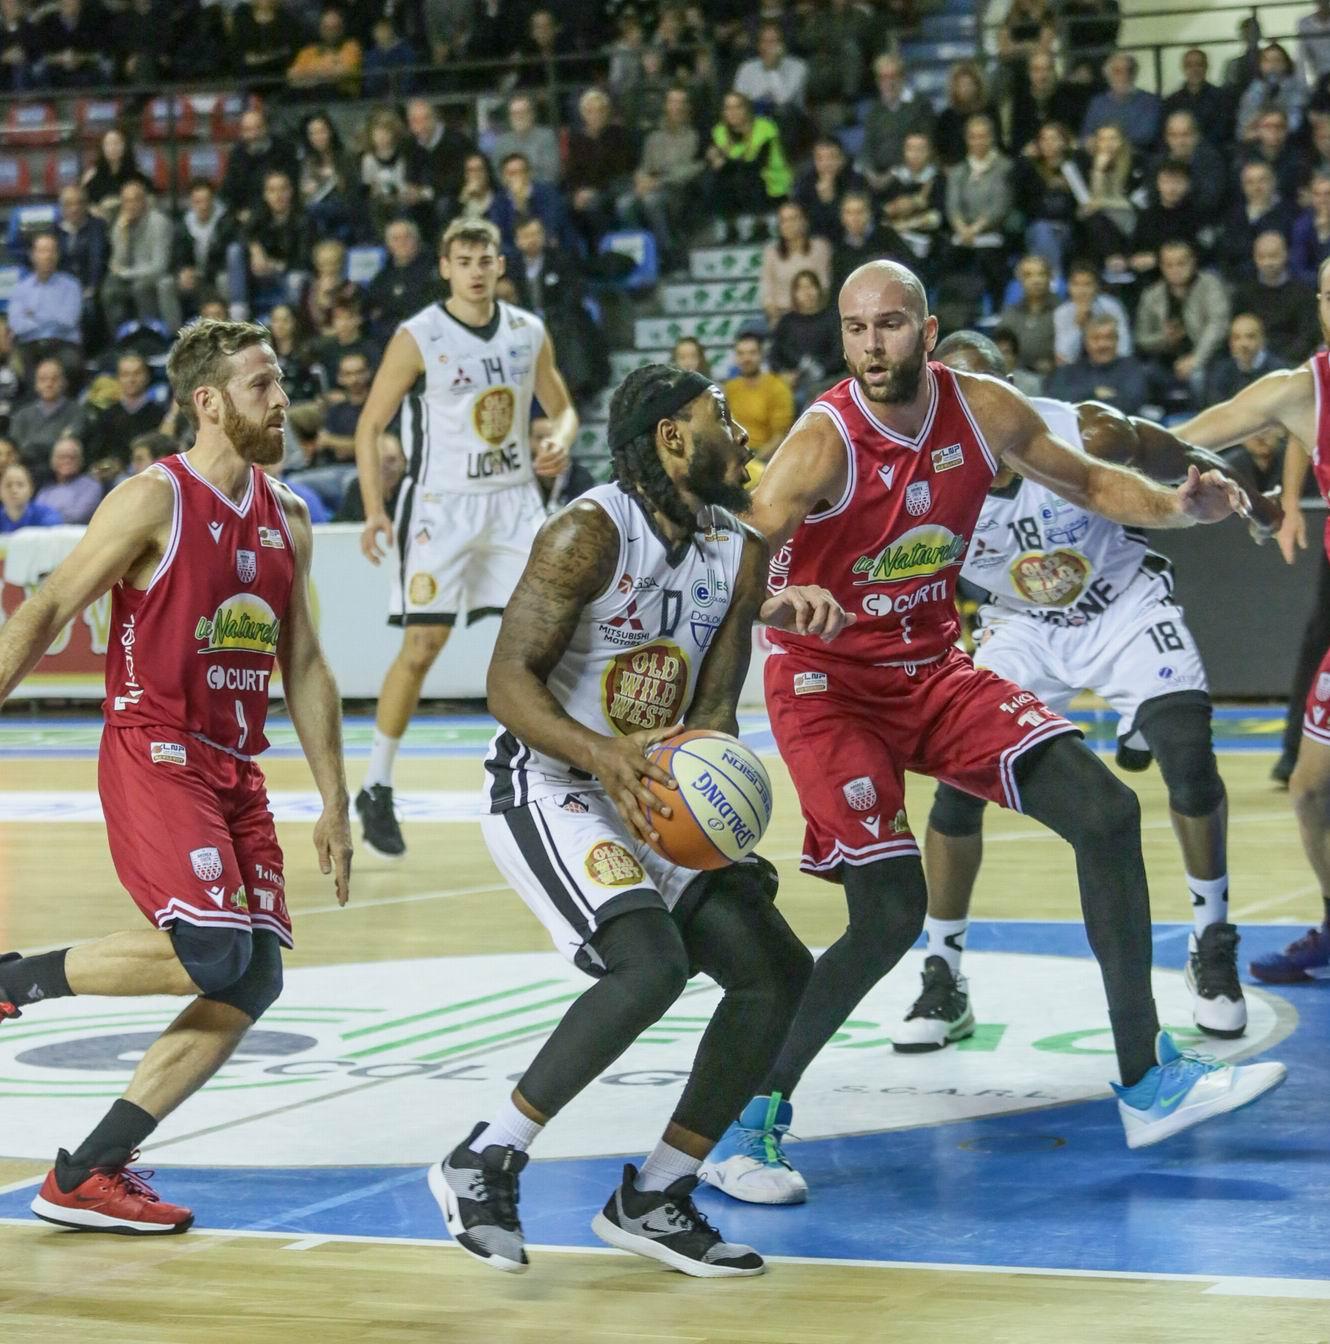 Basket, Naturelle spazzata via a Udine (104-72)